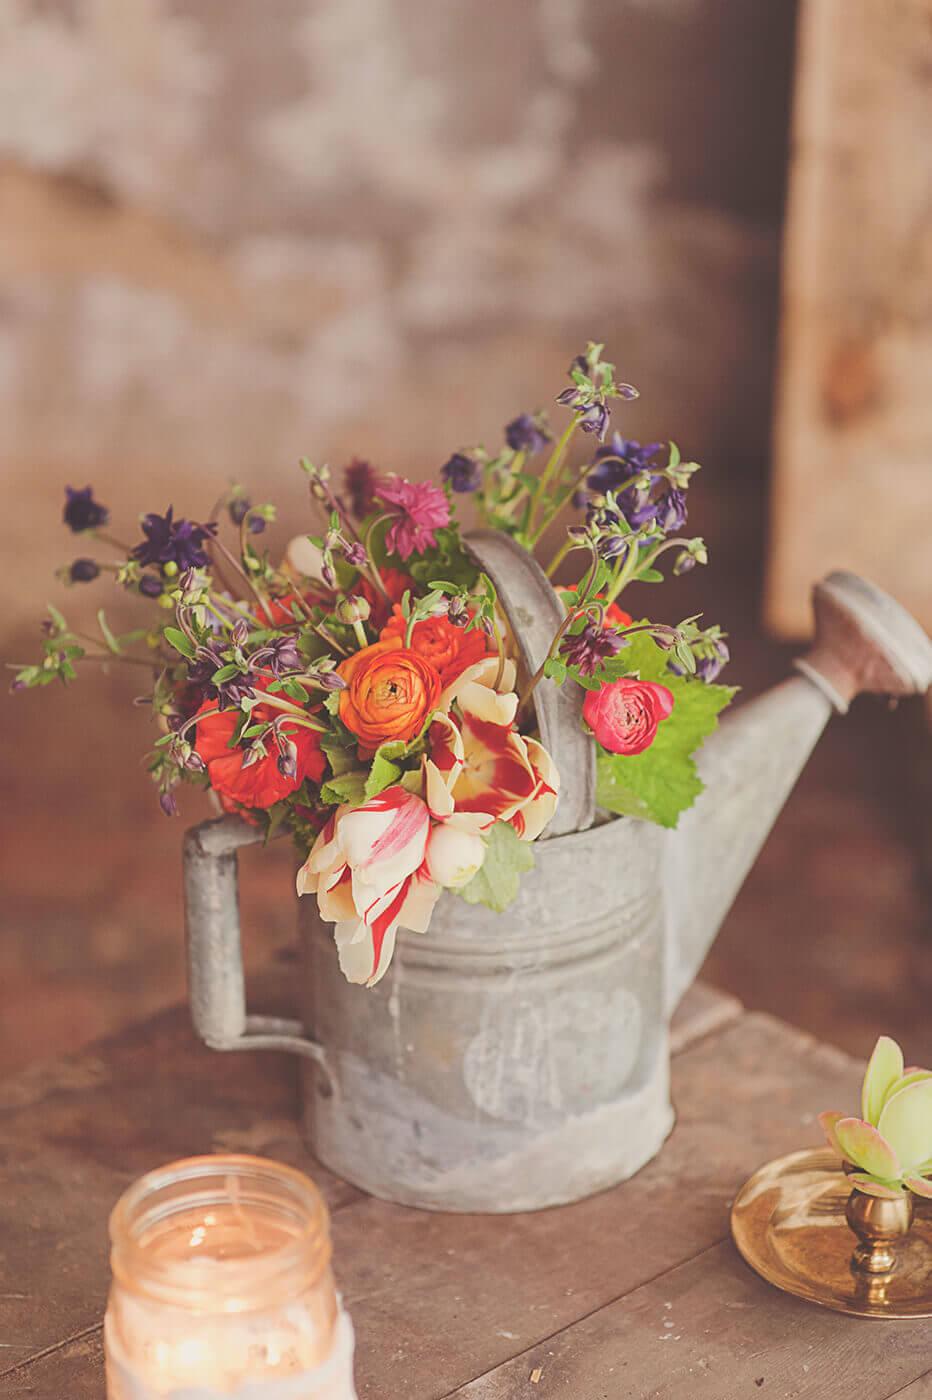 34 Best Vintage Garden Decor Ideas and Designs for 2020 on Garden Decor Ideas  id=91984